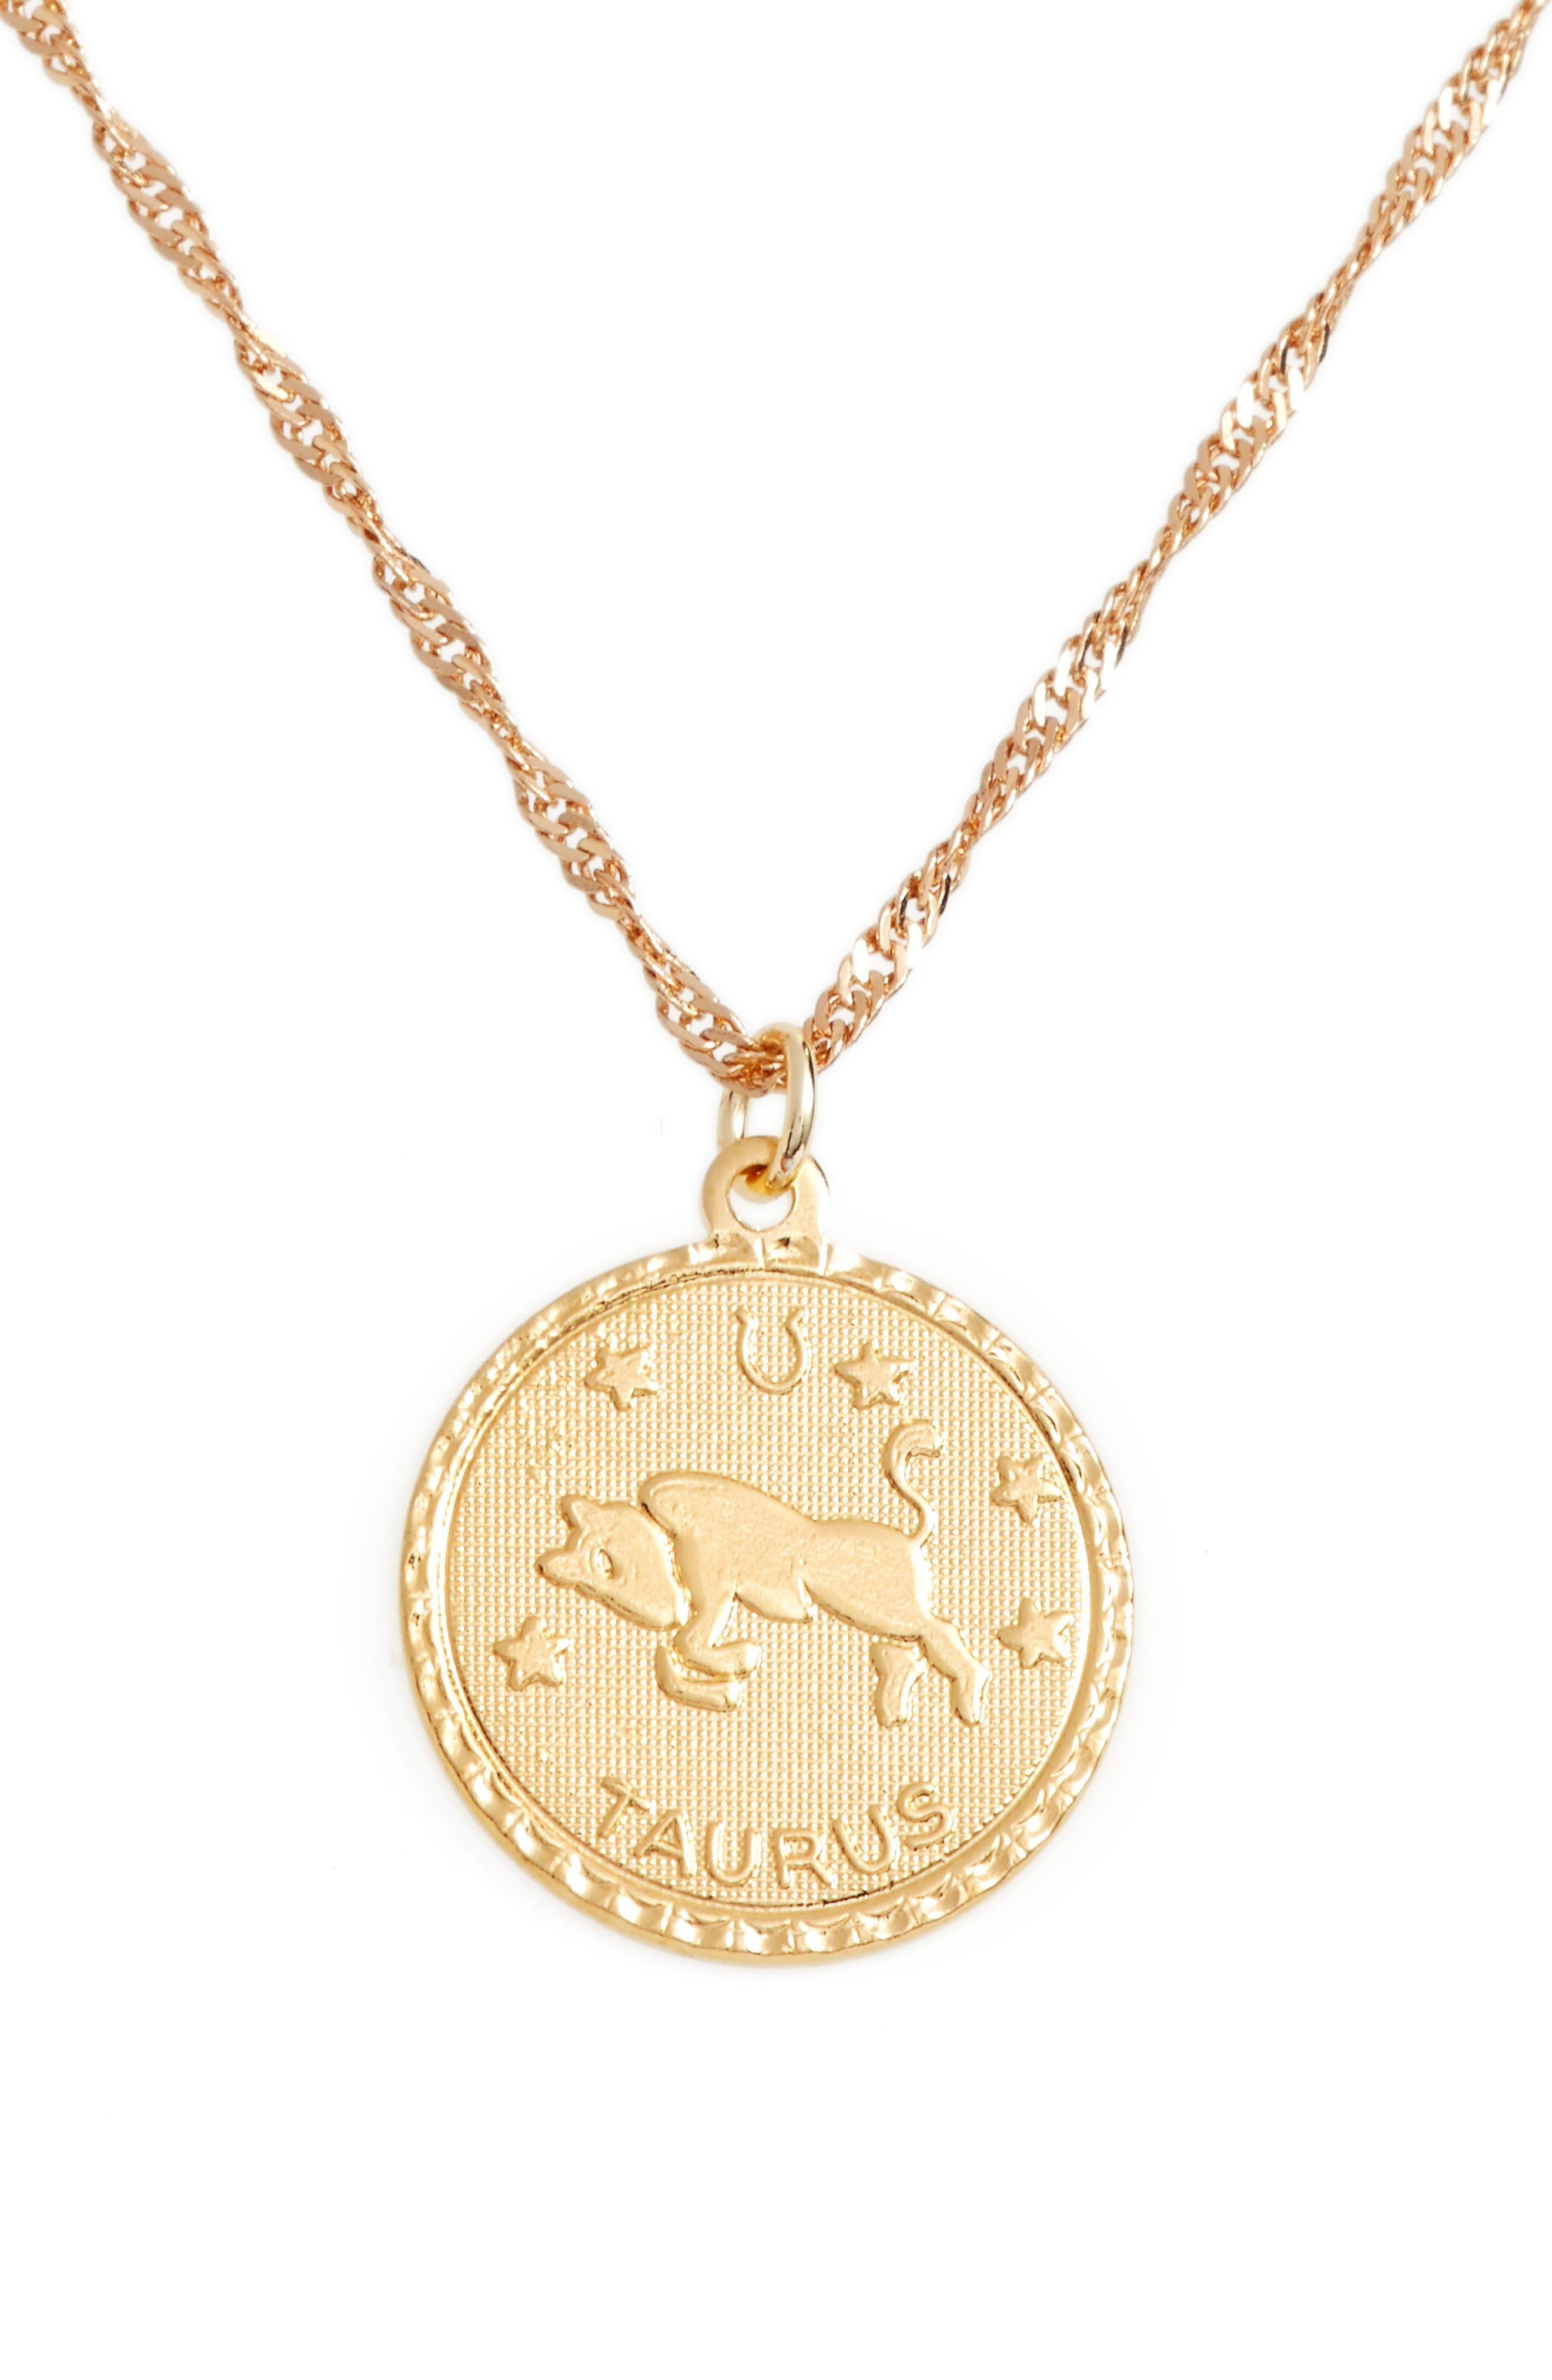 Ascending Taurus Pendant Necklace,                             Alternate thumbnail 2, color,                             Yellow Gold